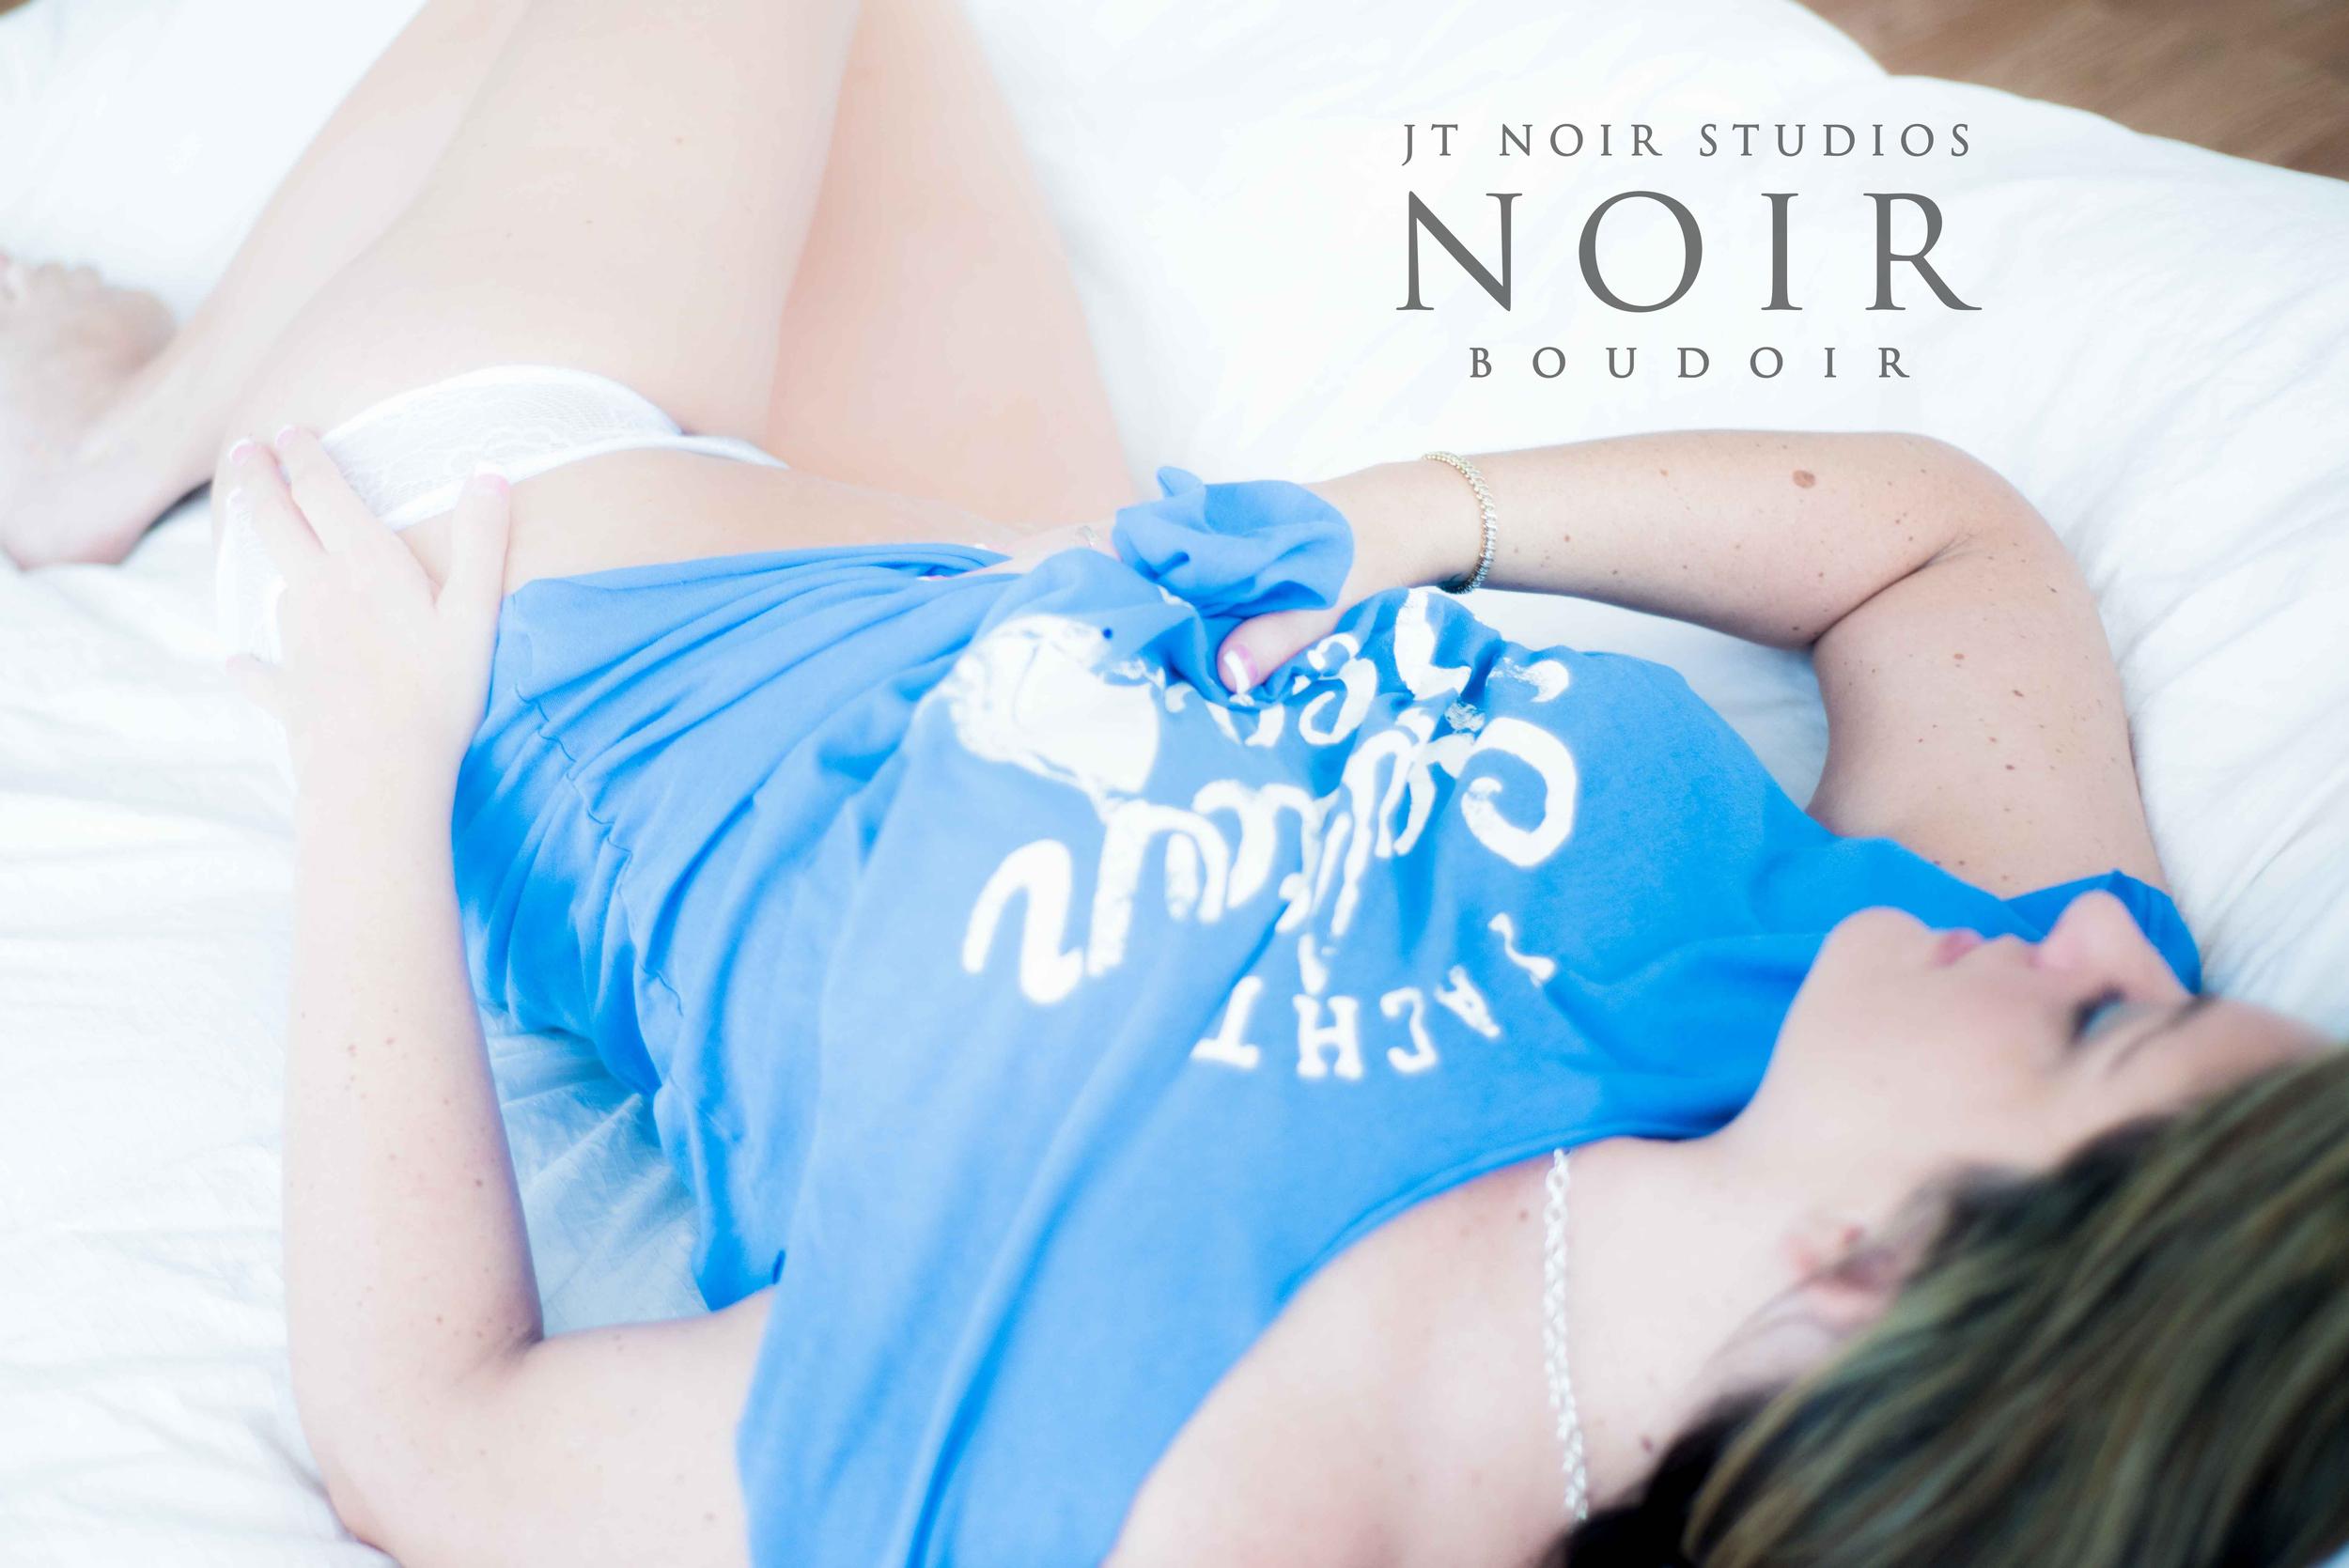 JTNoir_Boudoir_JO_Album-4.jpg